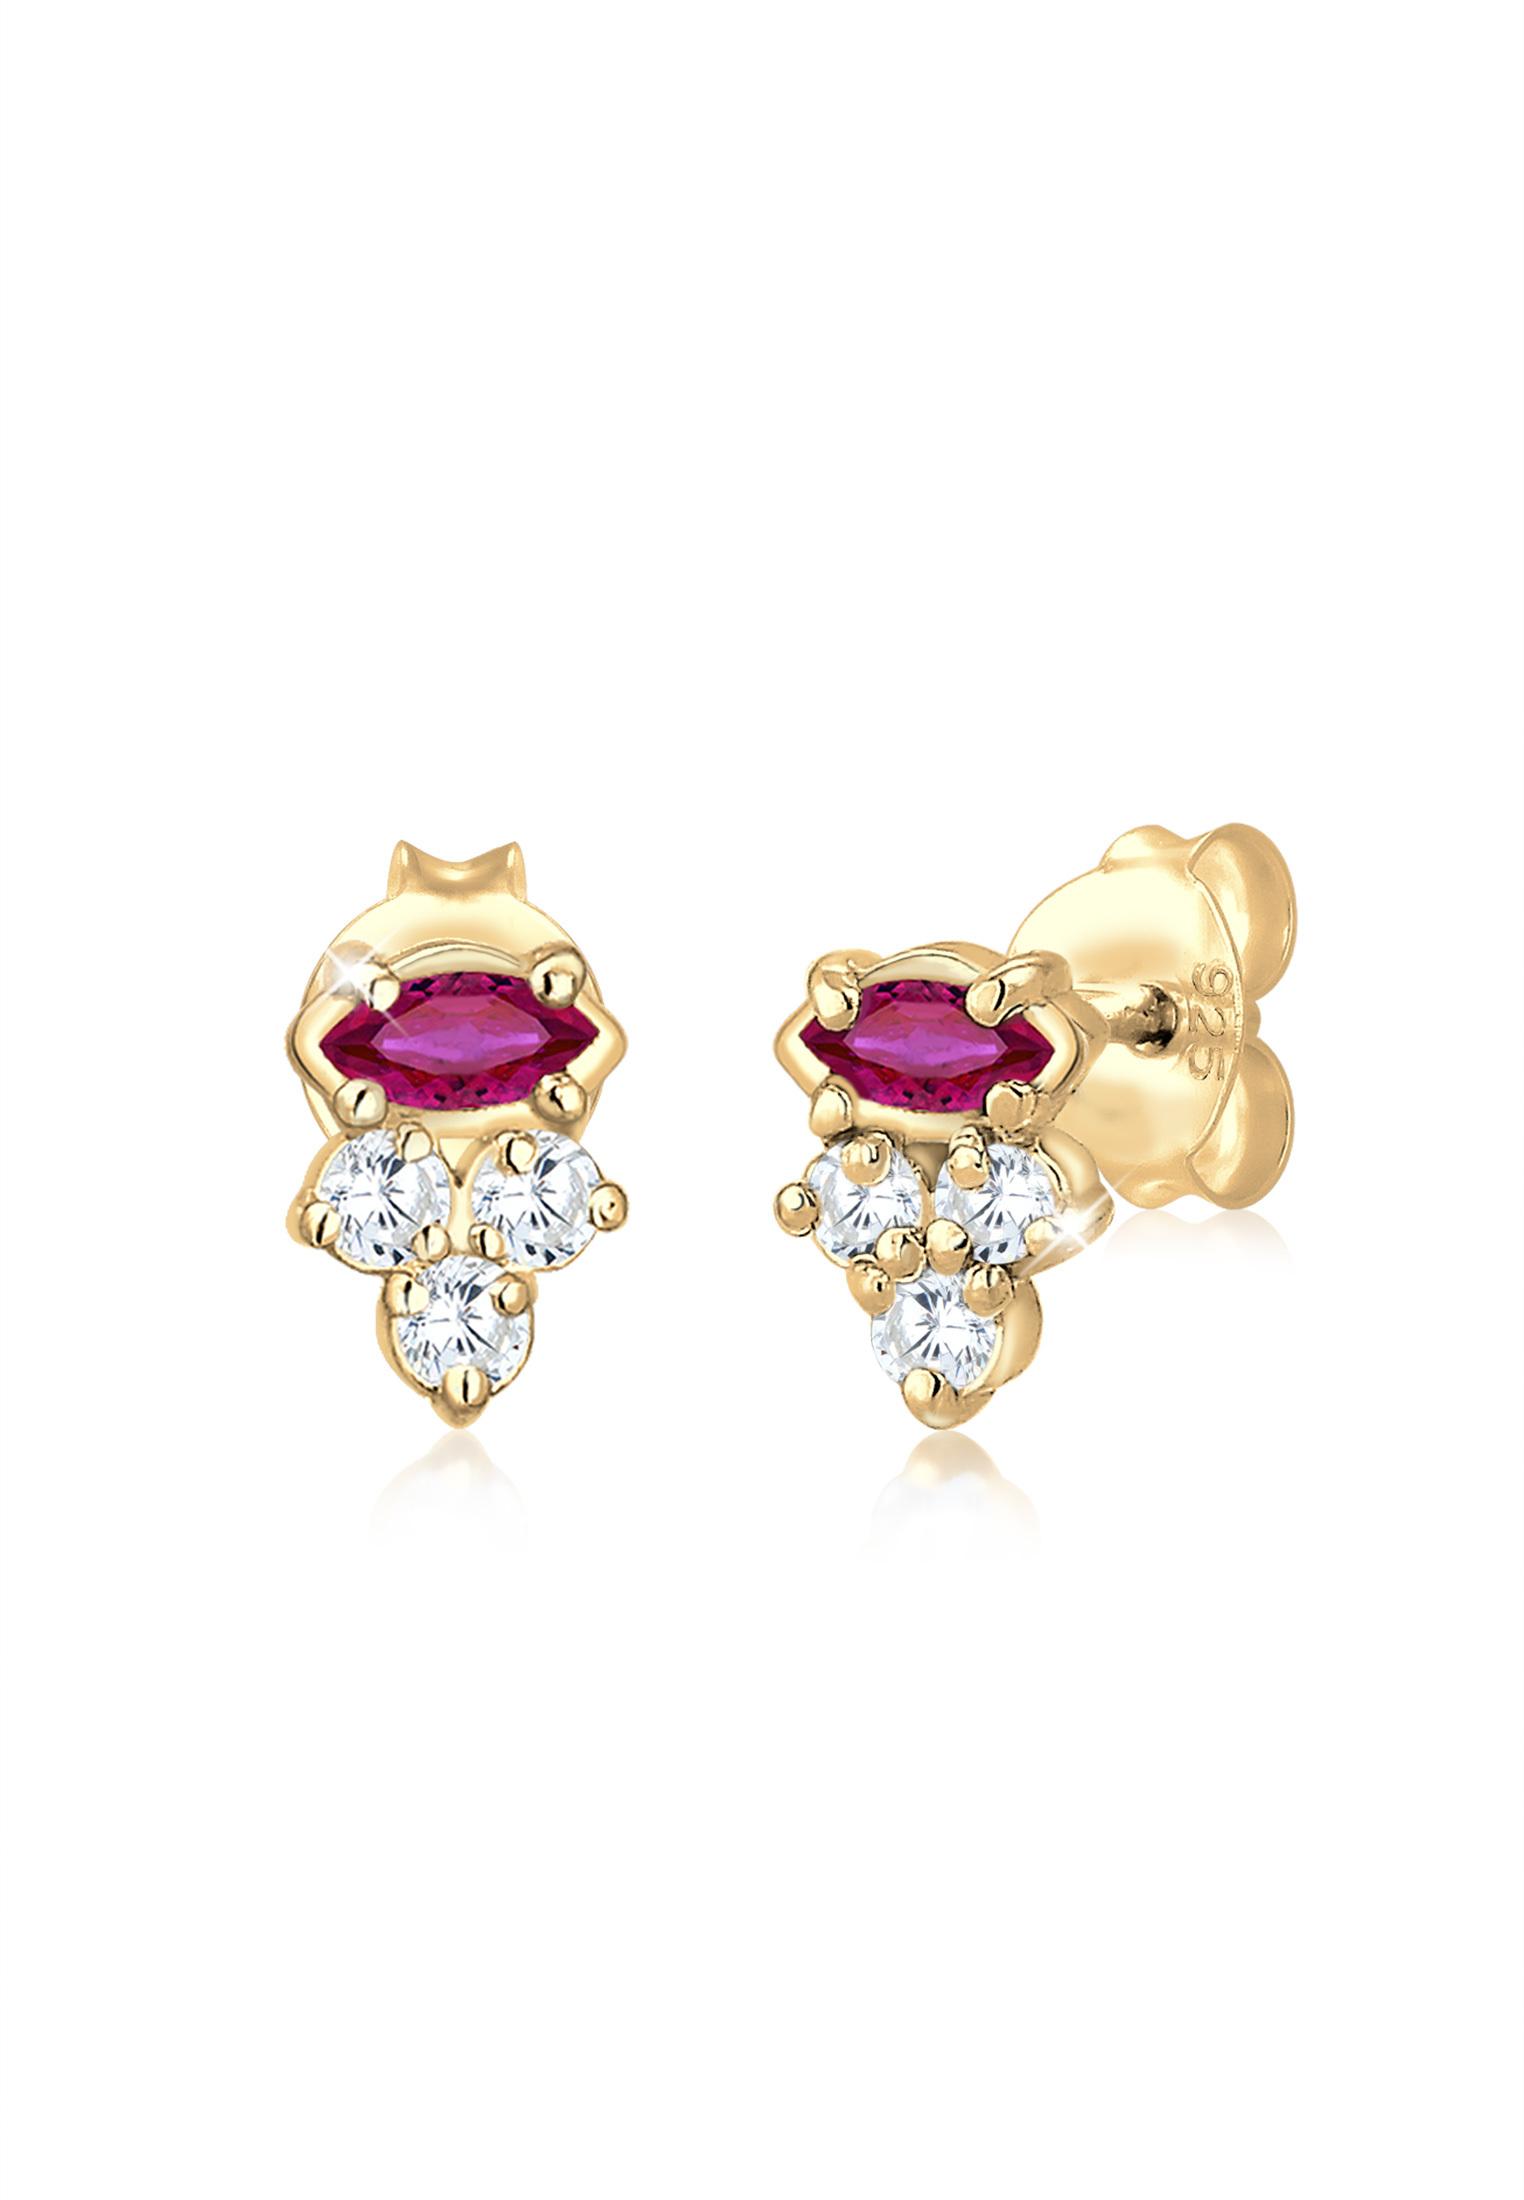 Ohrstecker | Rubin ( Pink ) | 925 Sterling Silber vergoldet